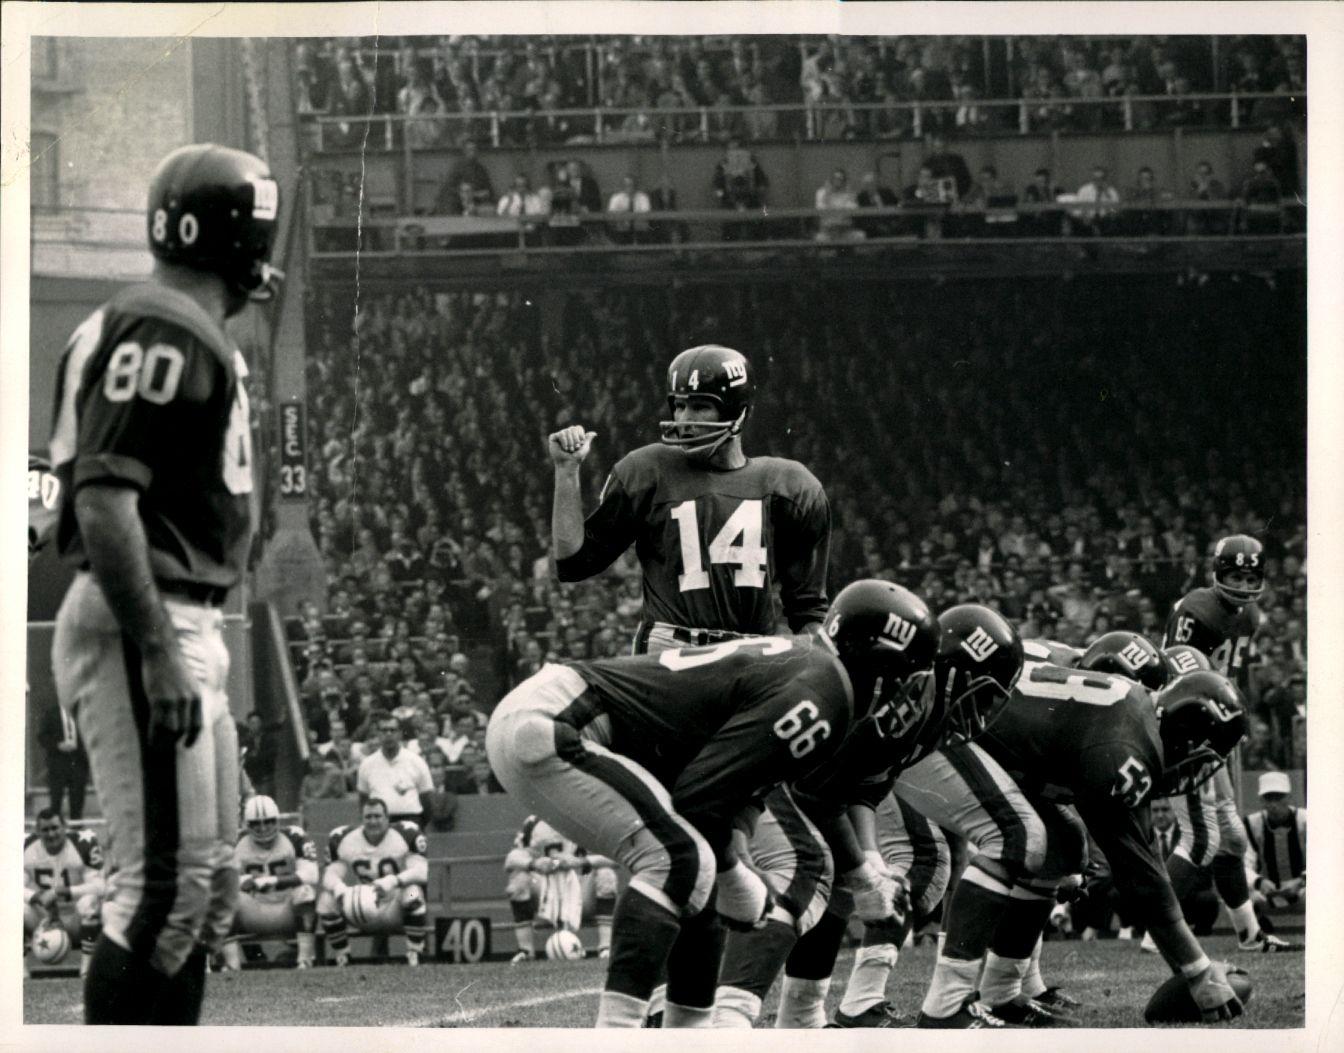 NY Giants Game At Yankee Stadium